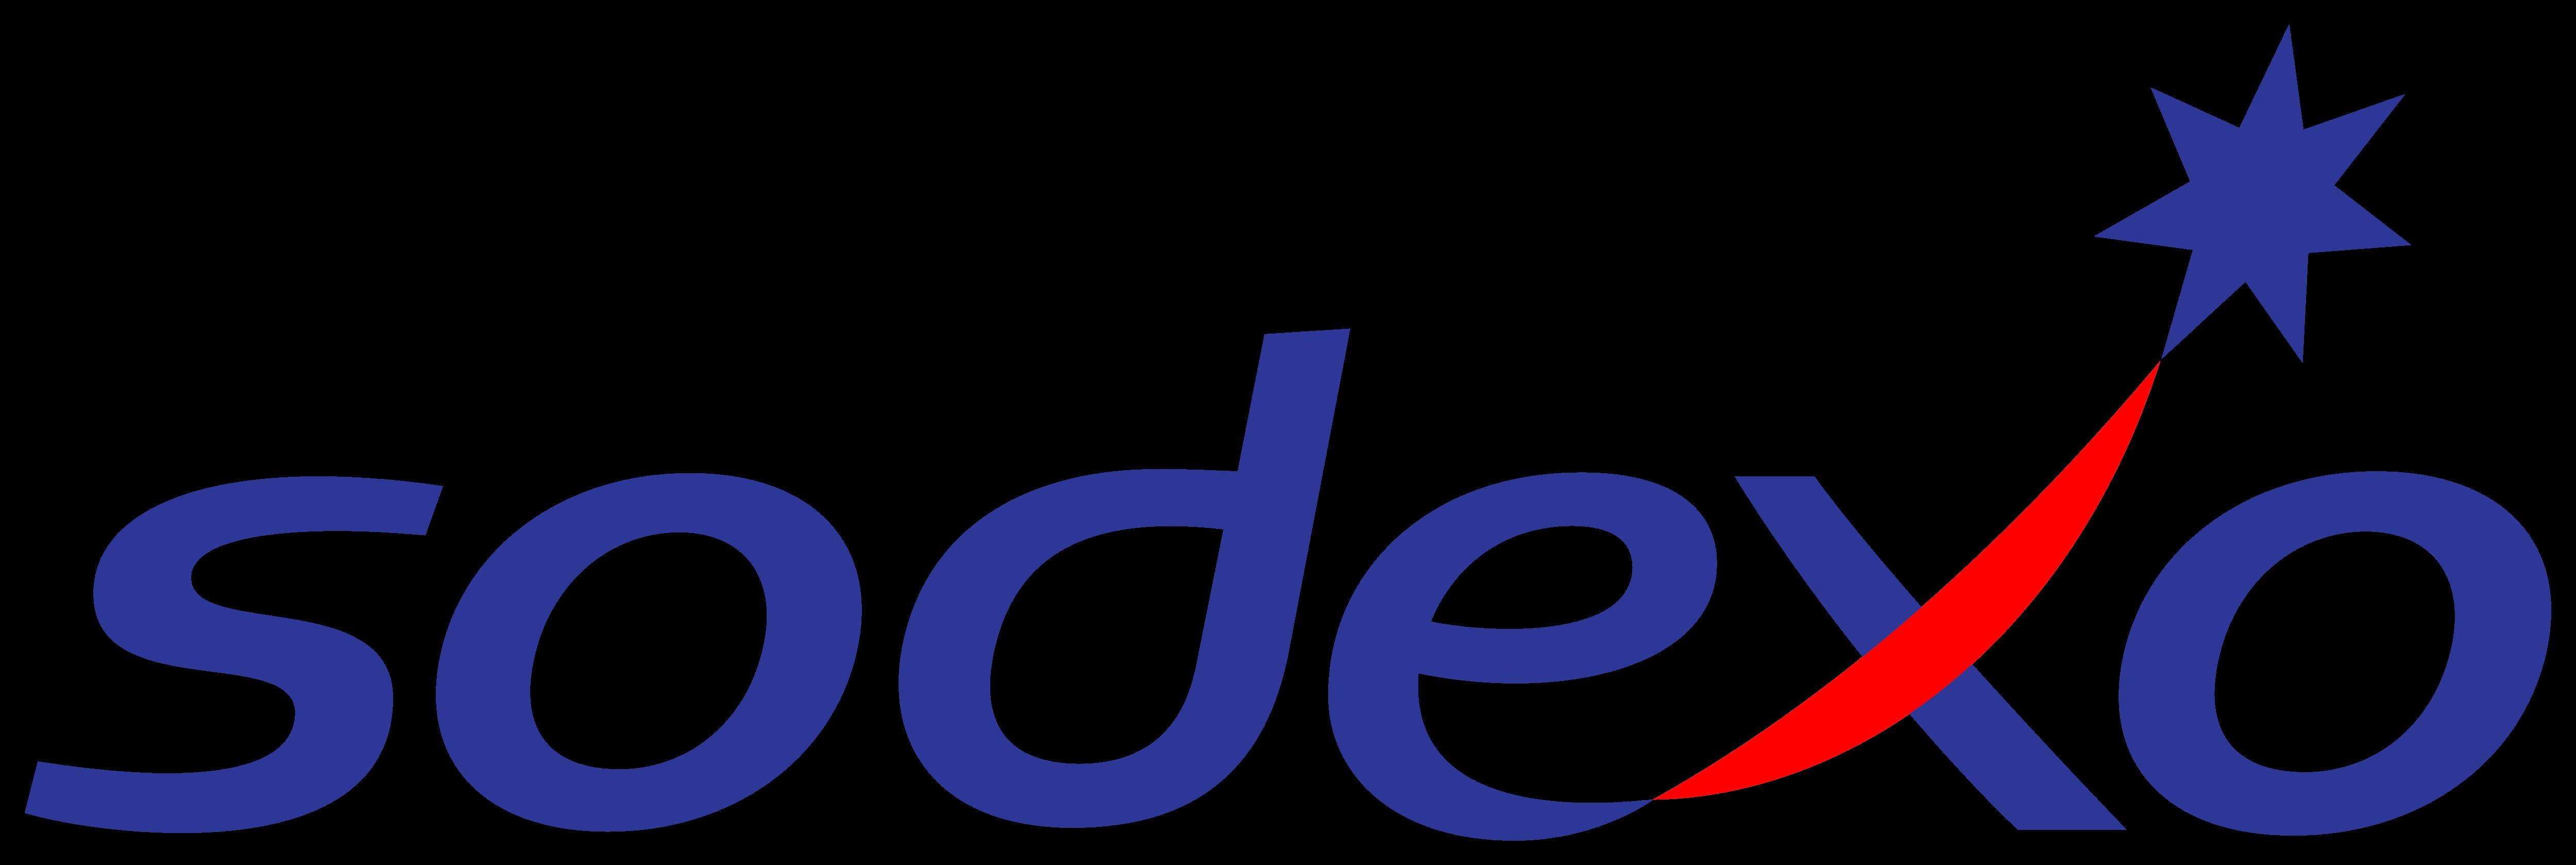 Sodexo_logo_logotype